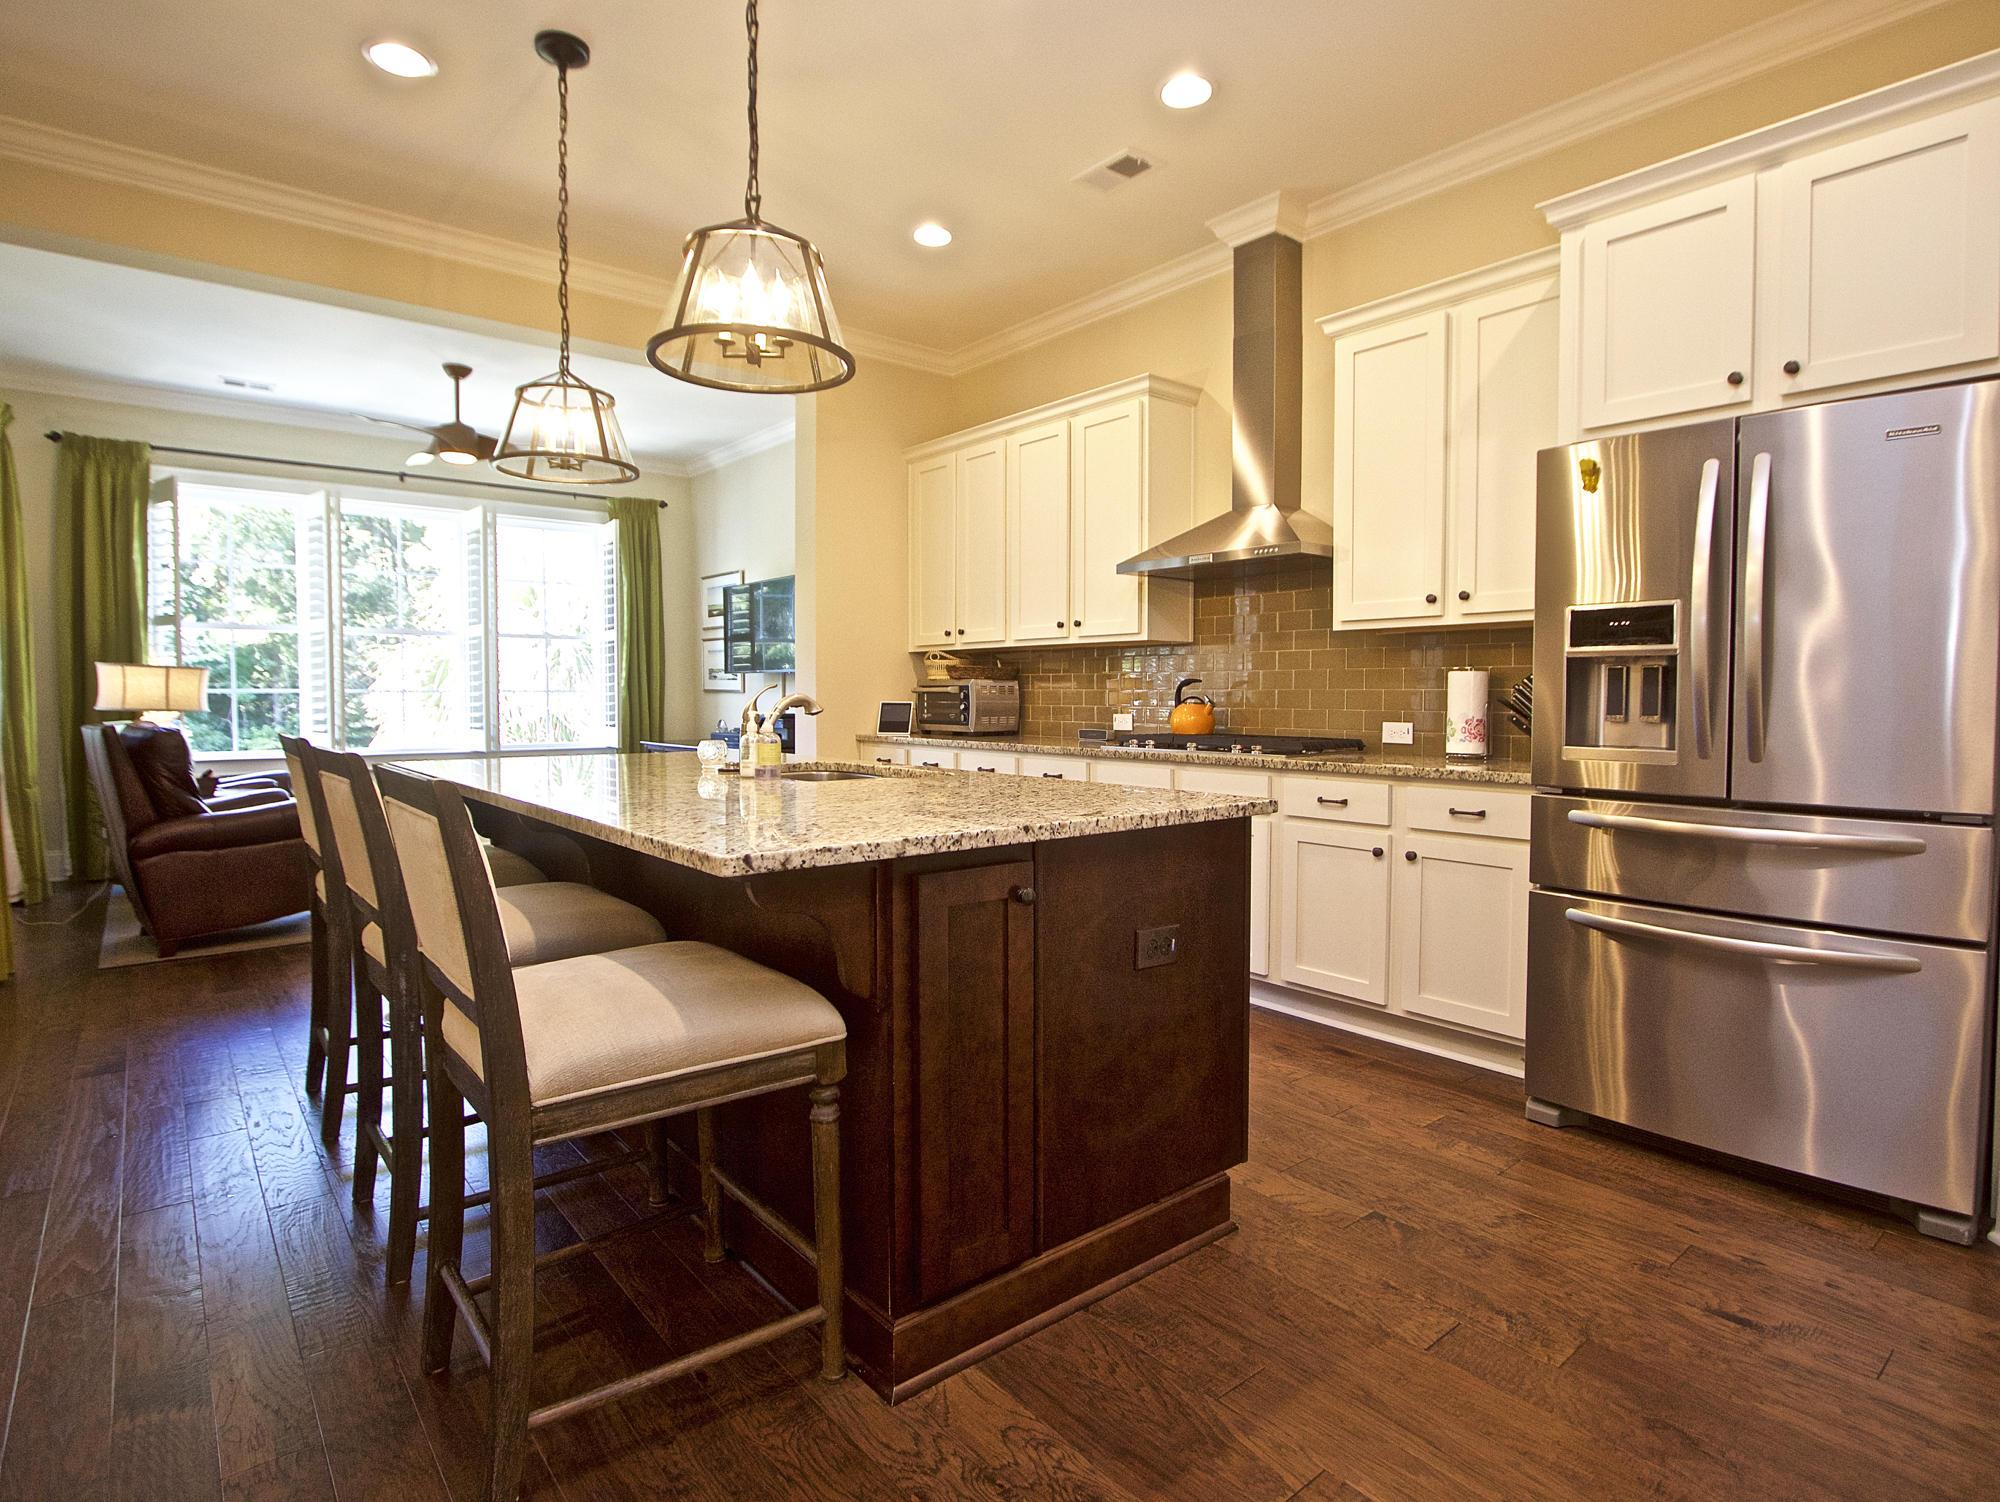 Hamlin Plantation Homes For Sale - 3089 Monhegan, Mount Pleasant, SC - 1